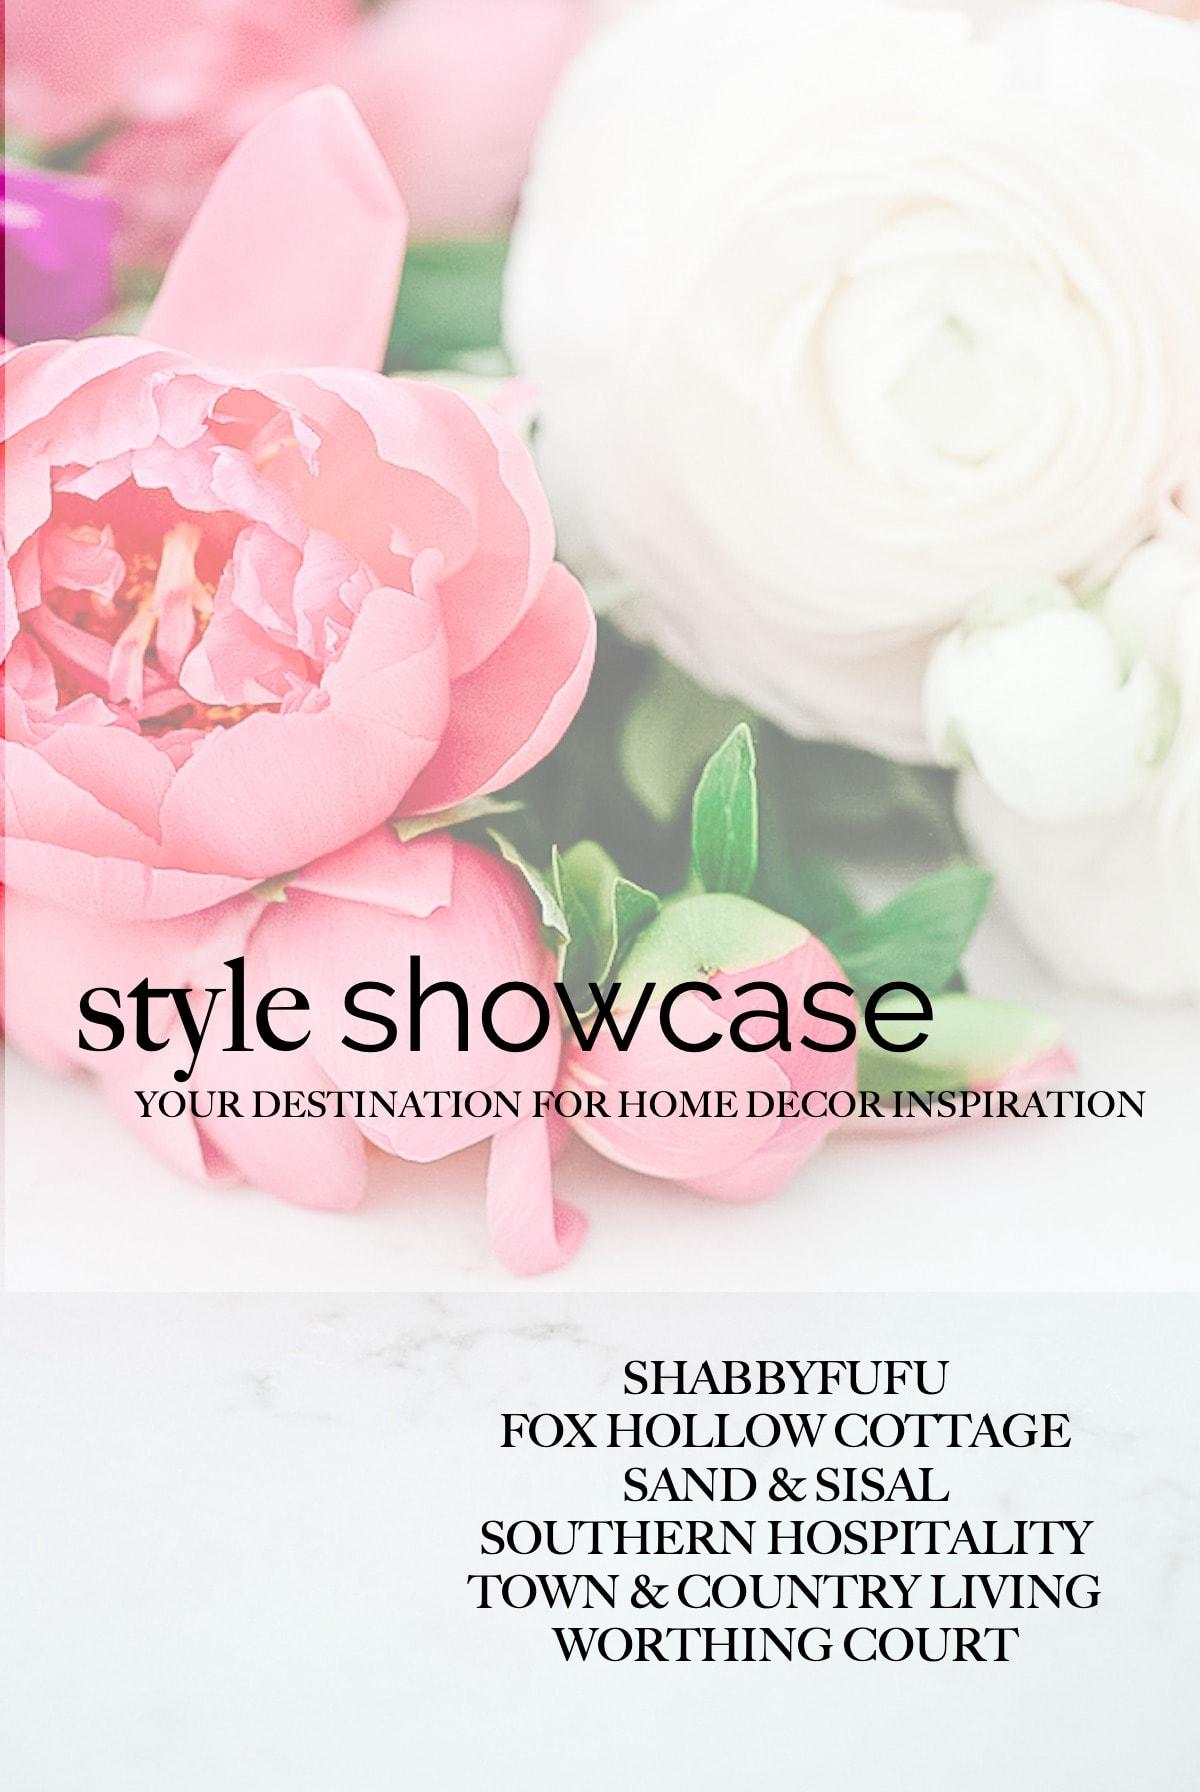 The Style Showcase logo